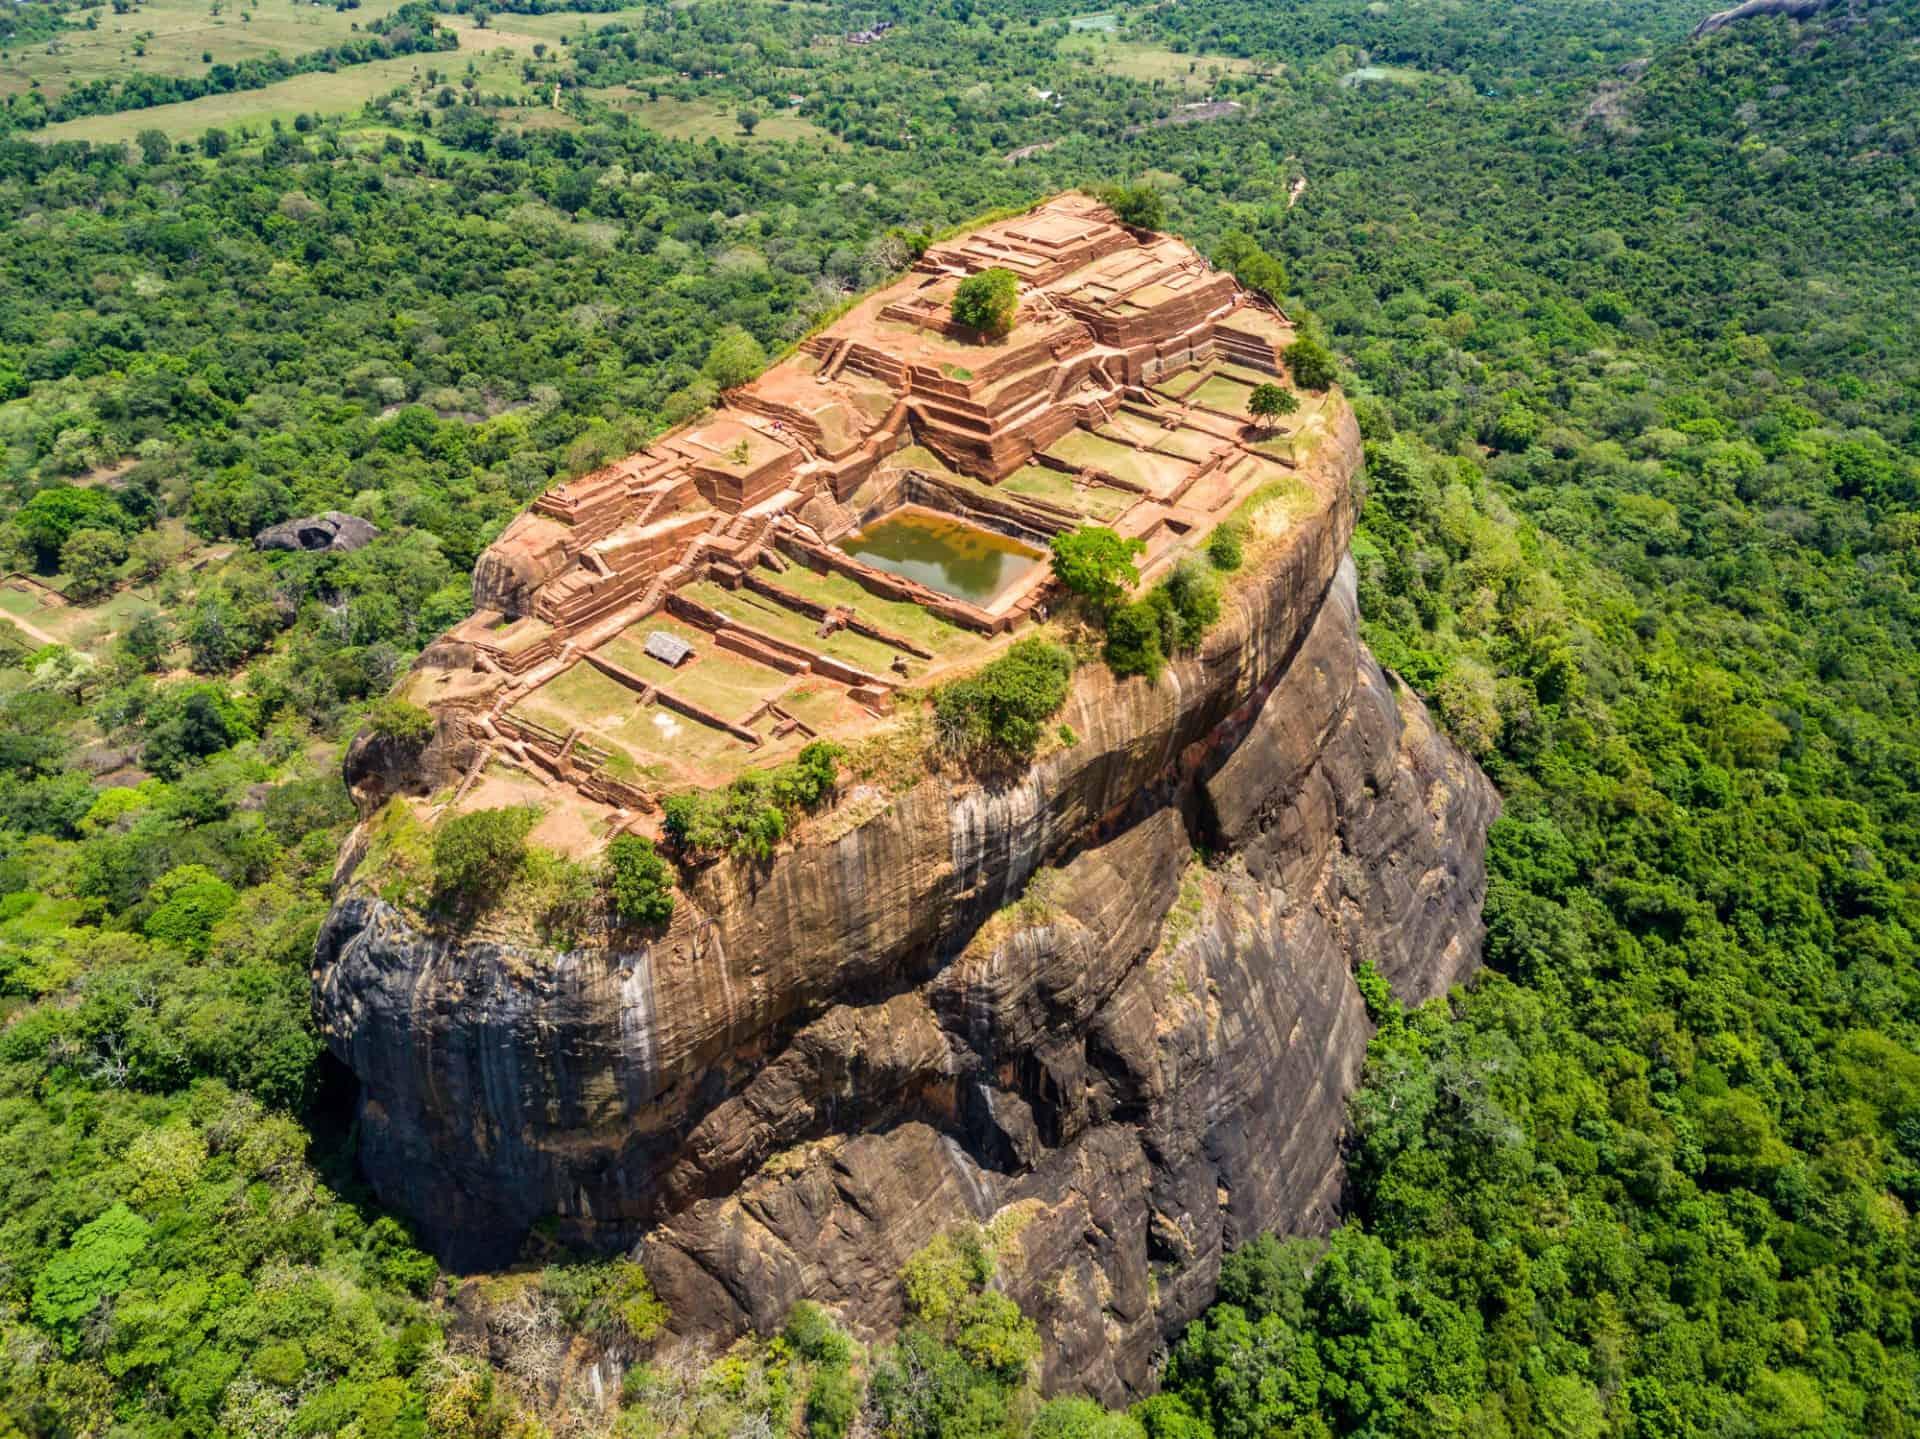 Aerial View of the Sigiriya Rock Fortress in Sri Lanka